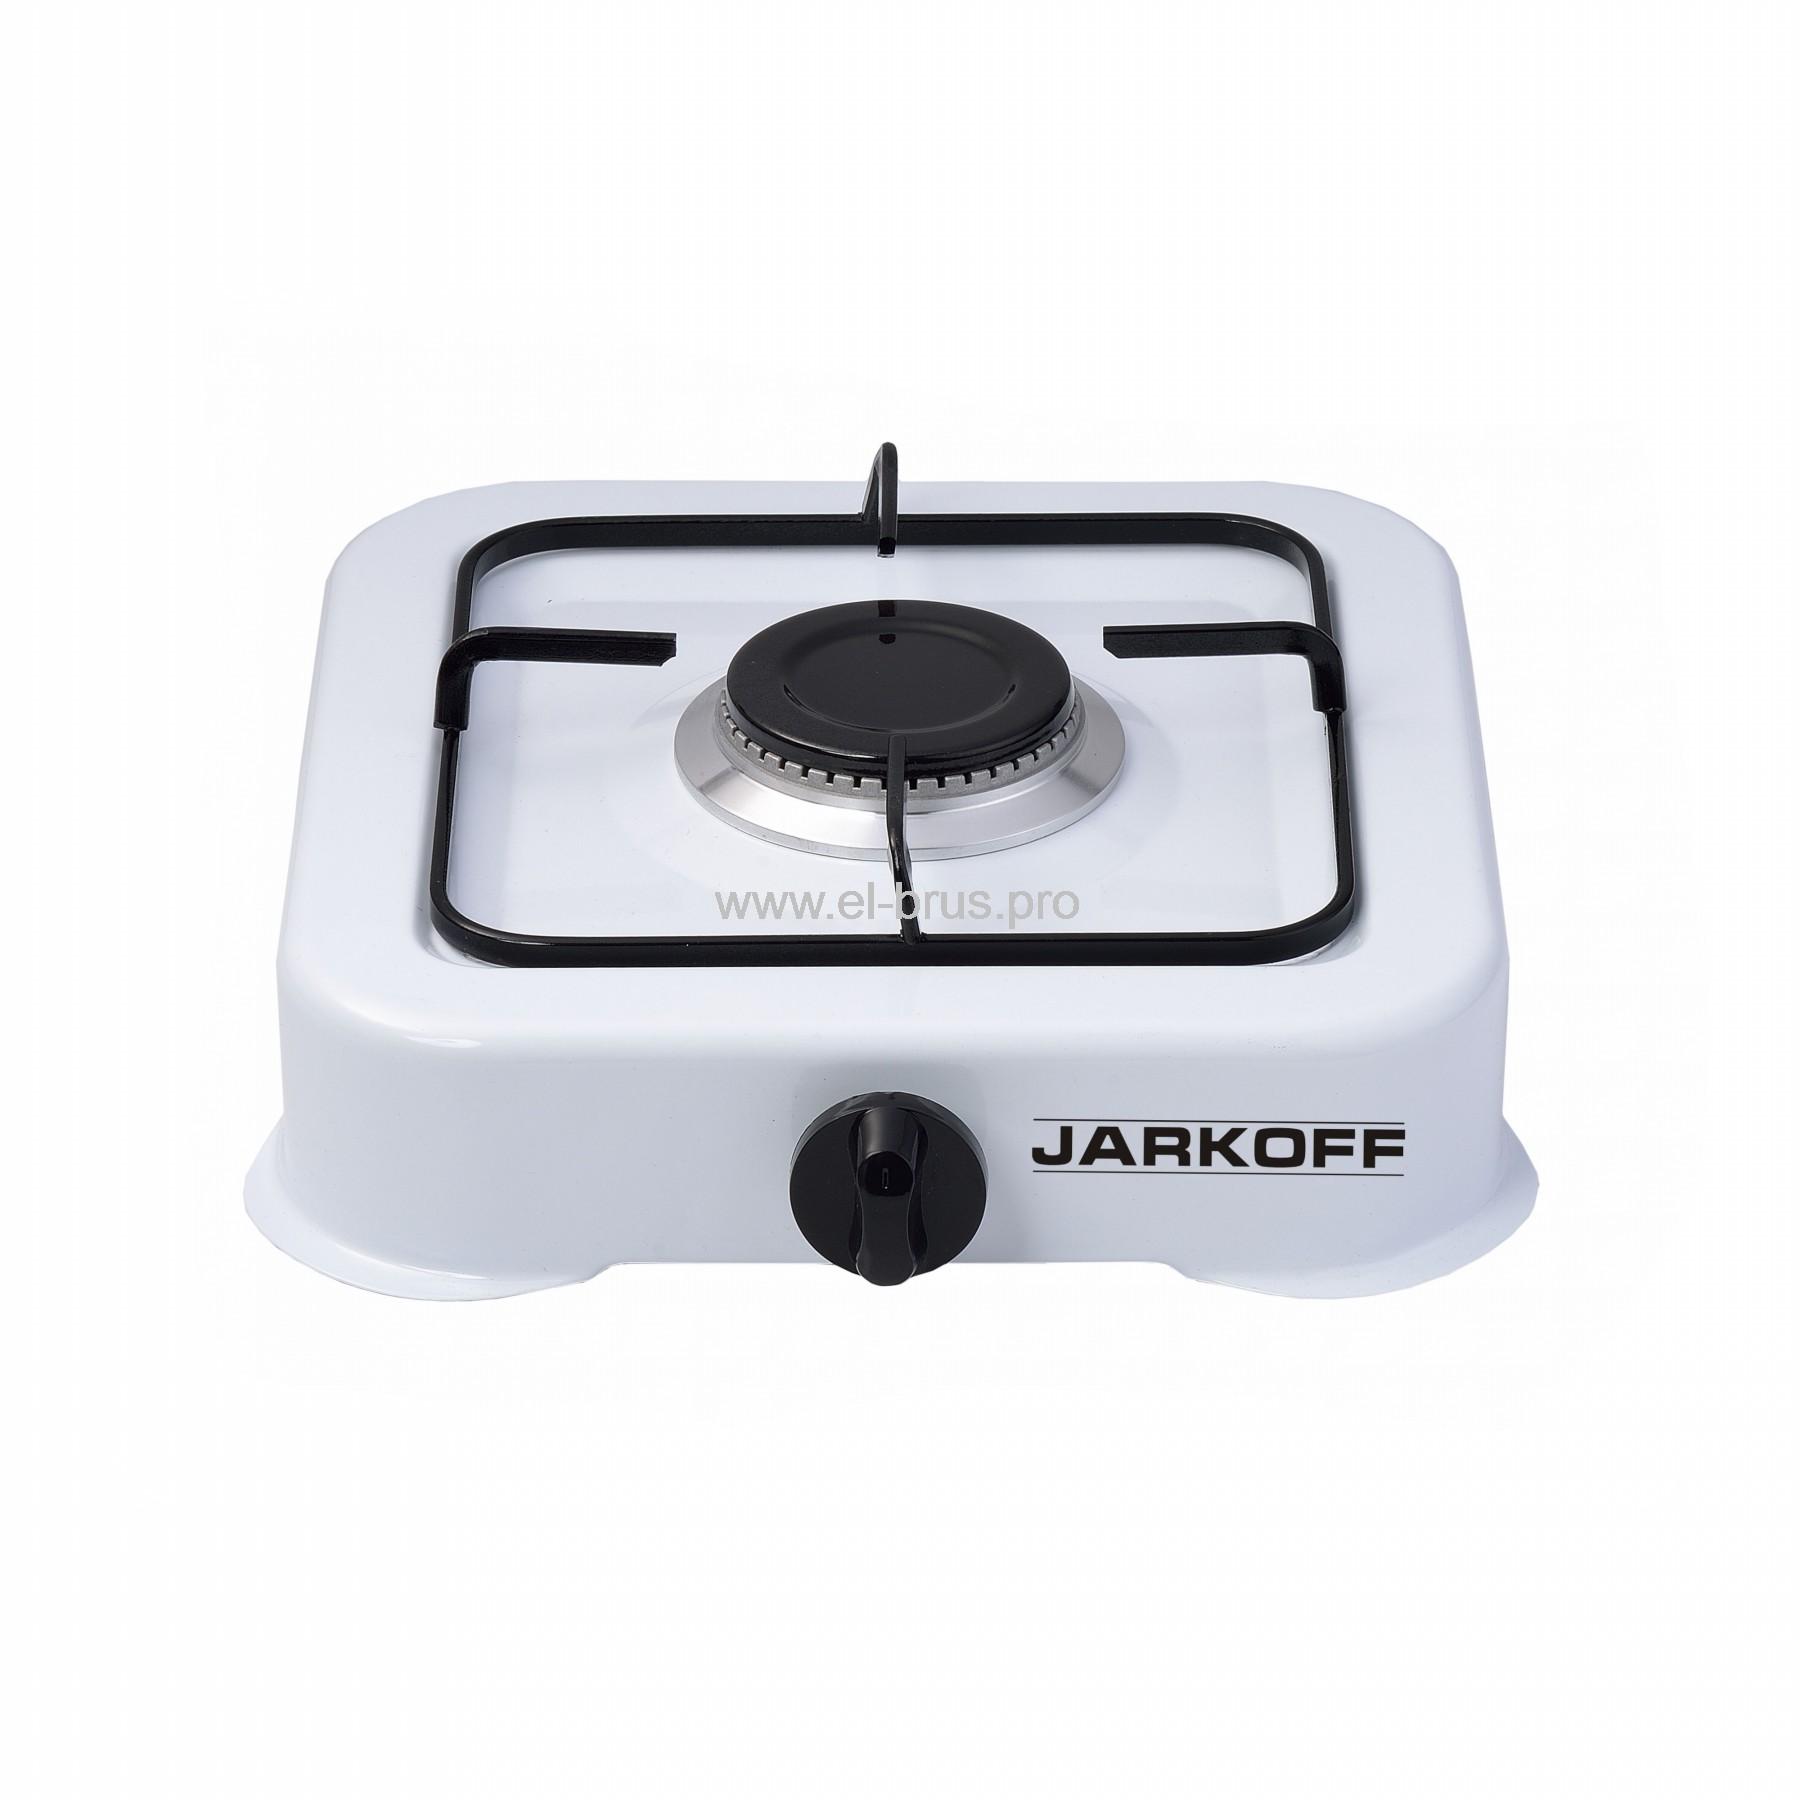 Плита газовая 1-конф. белая JARKOFF JK-7301W